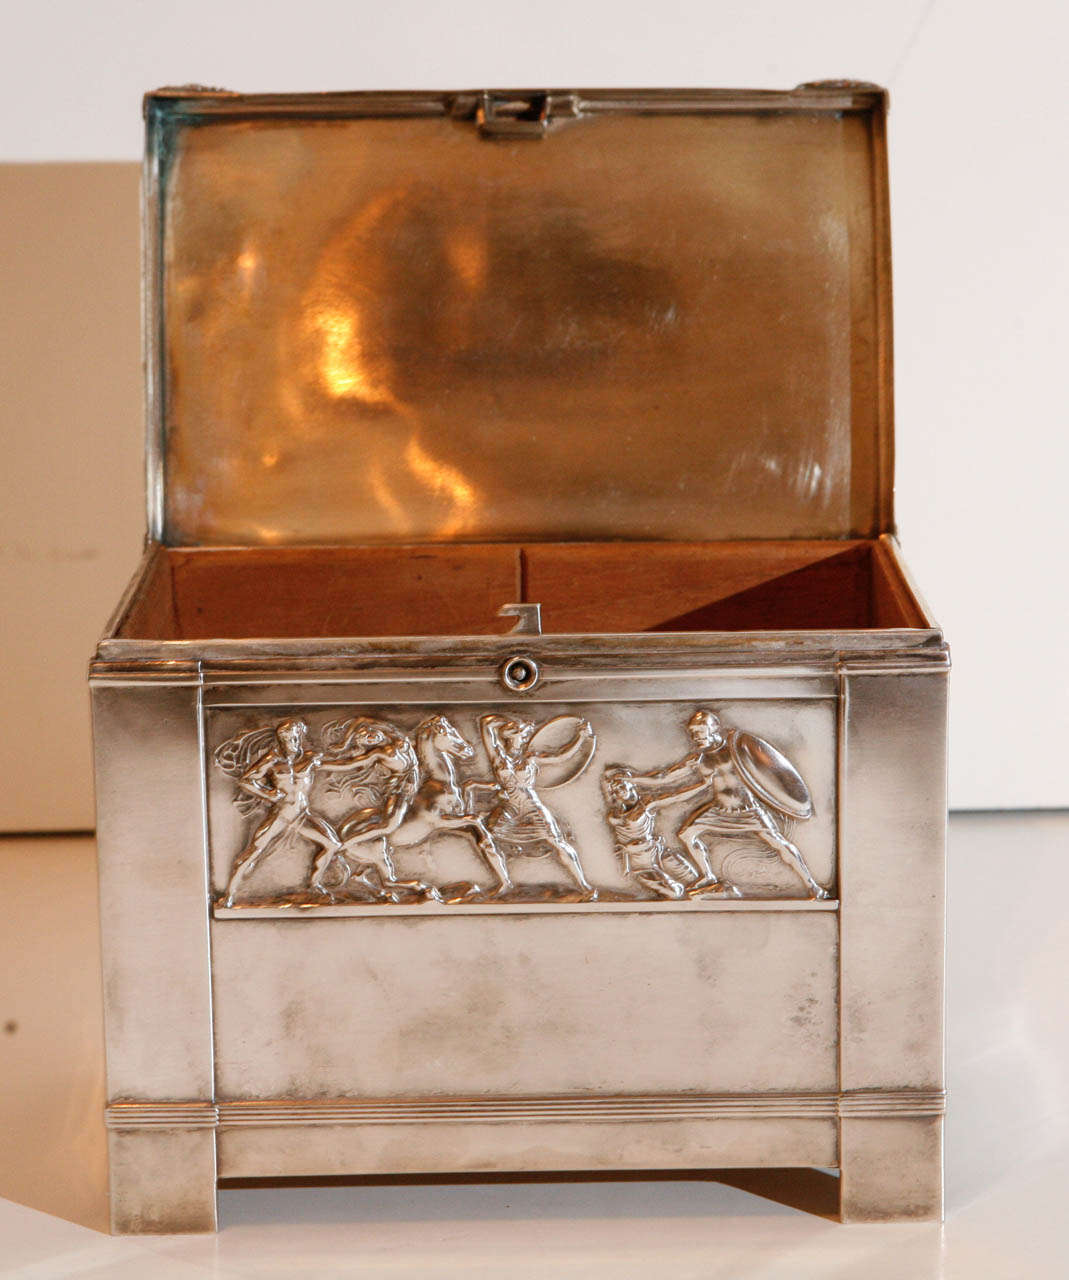 20th Century Italian Art-Deco Humidor For Sale